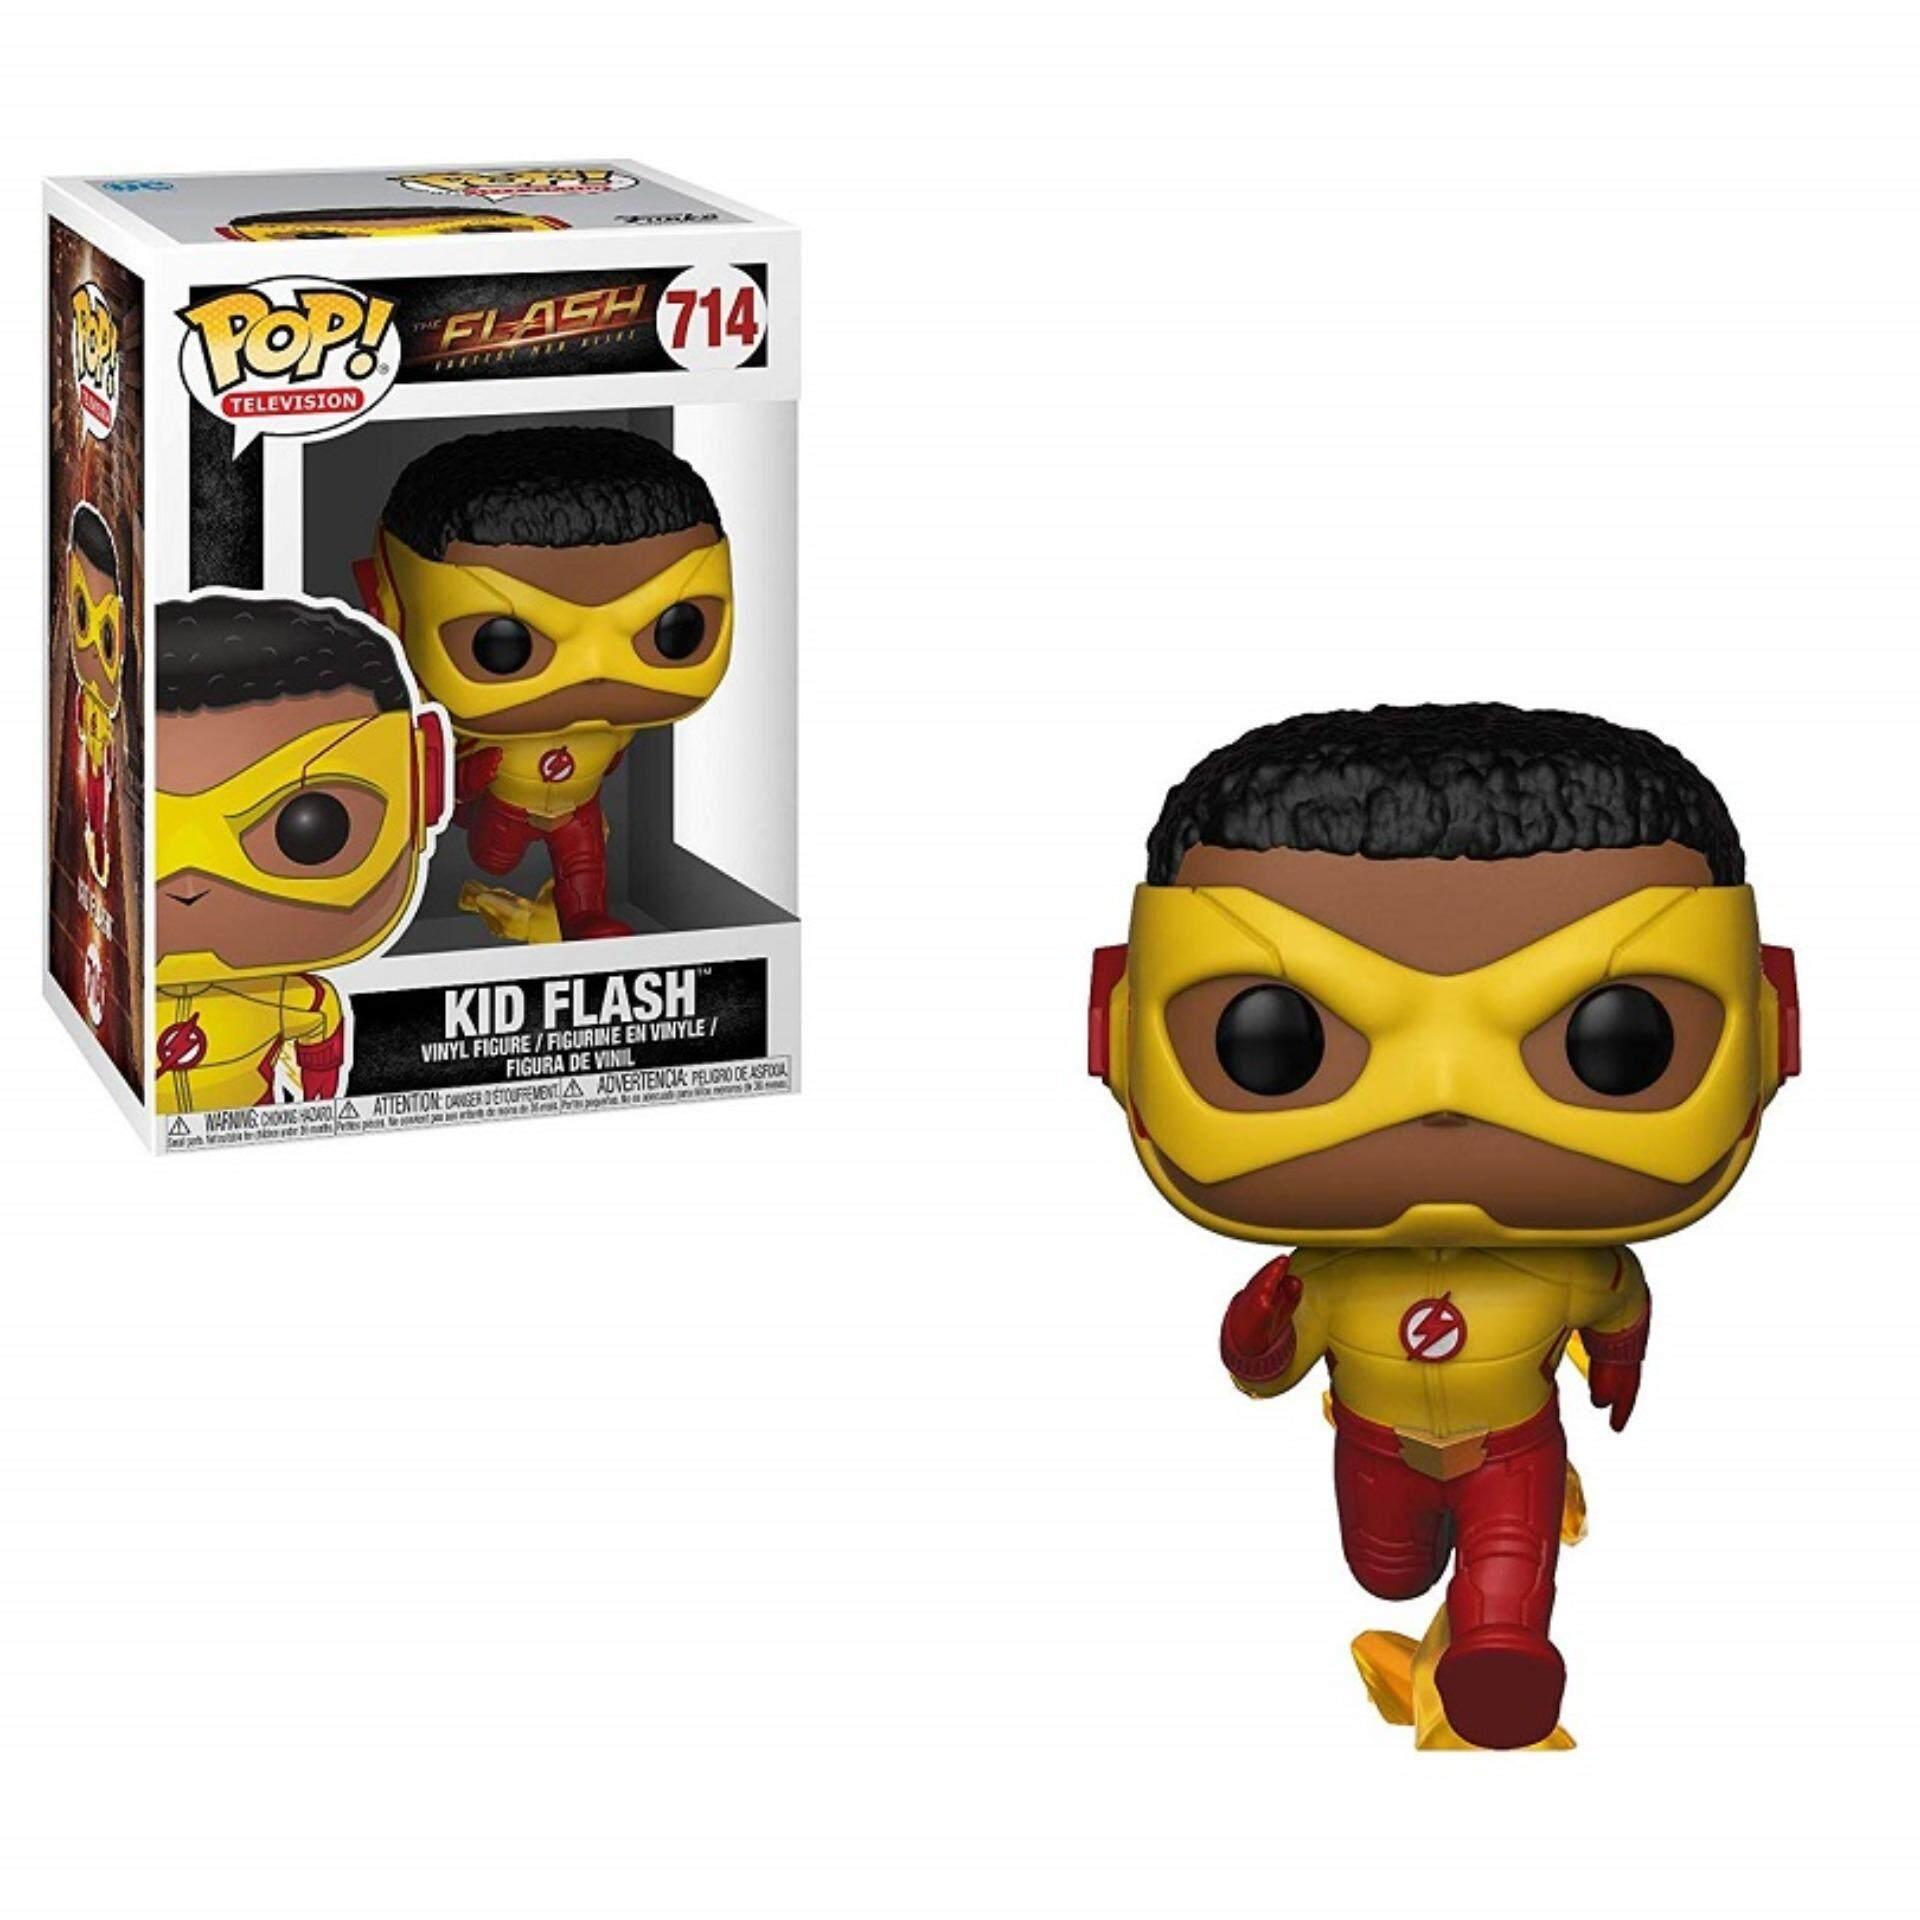 FUNKO POP! TV Series DC Comics The Flash - Kid Flash Toys for boys